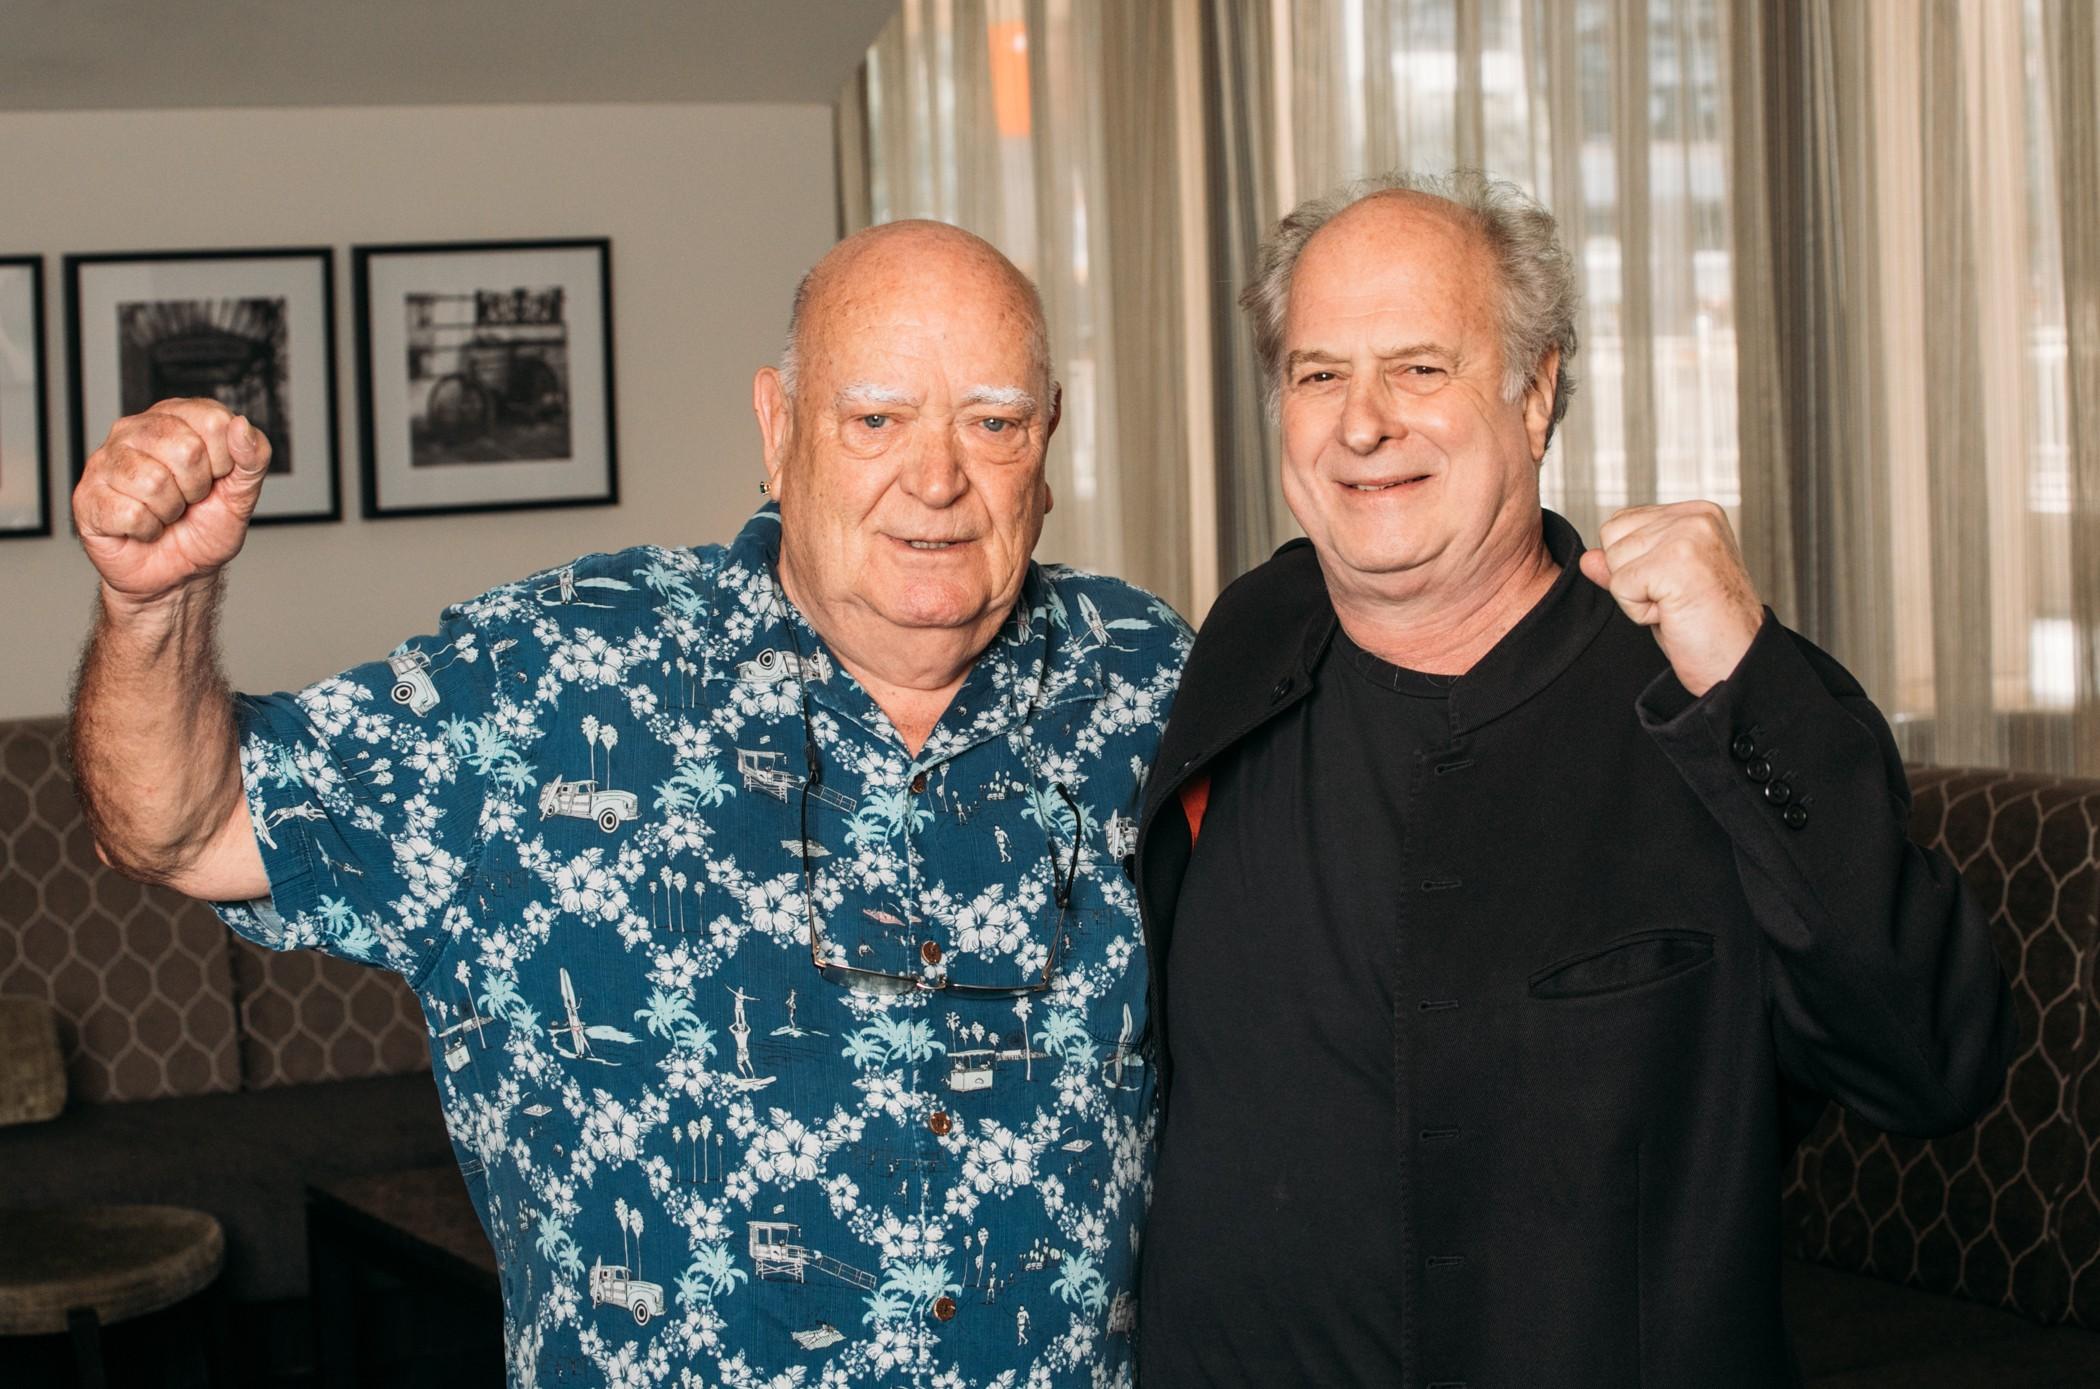 Michael Chugg and Michael Gudinski